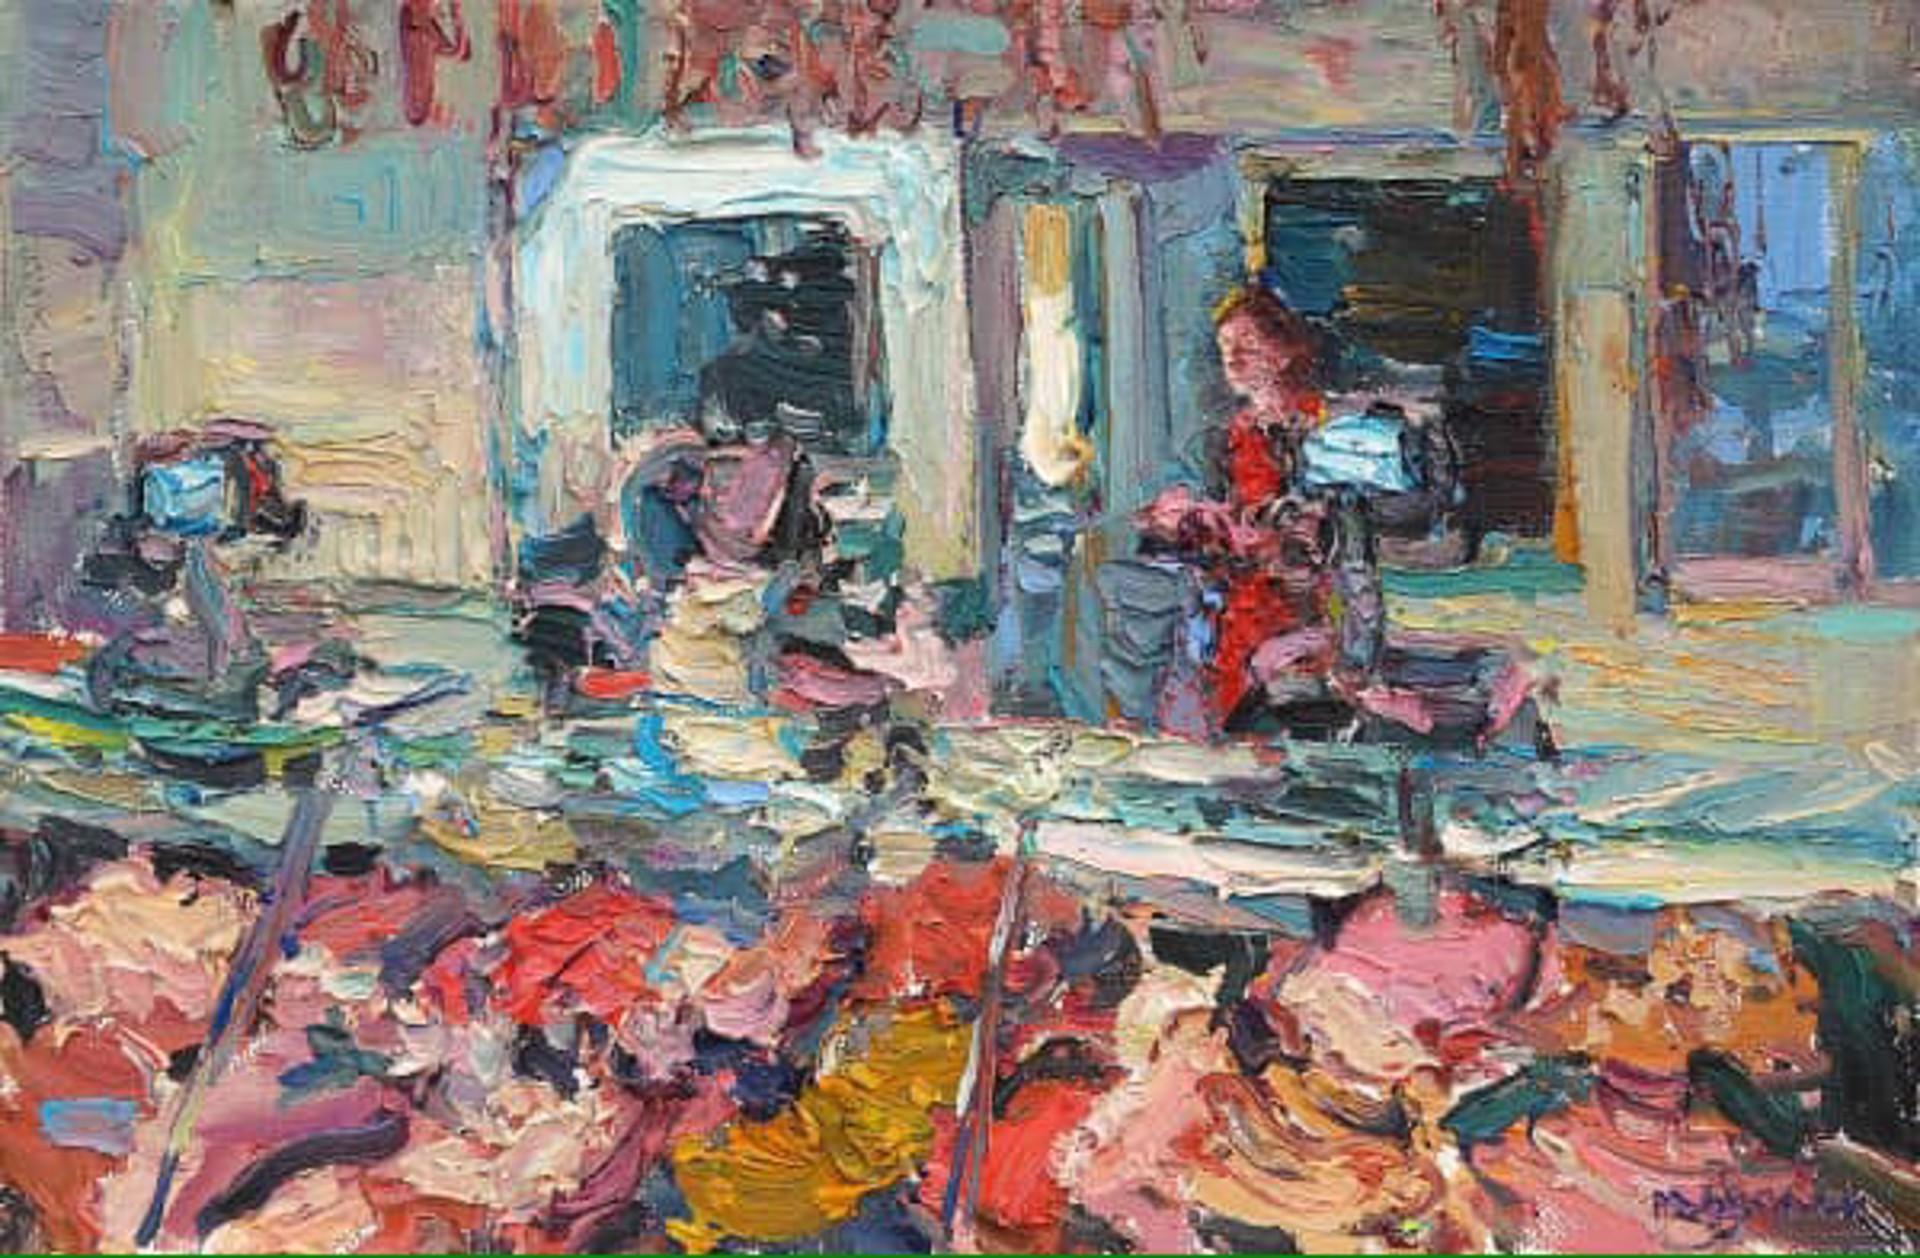 Butcher Shop by Antonin Passemard